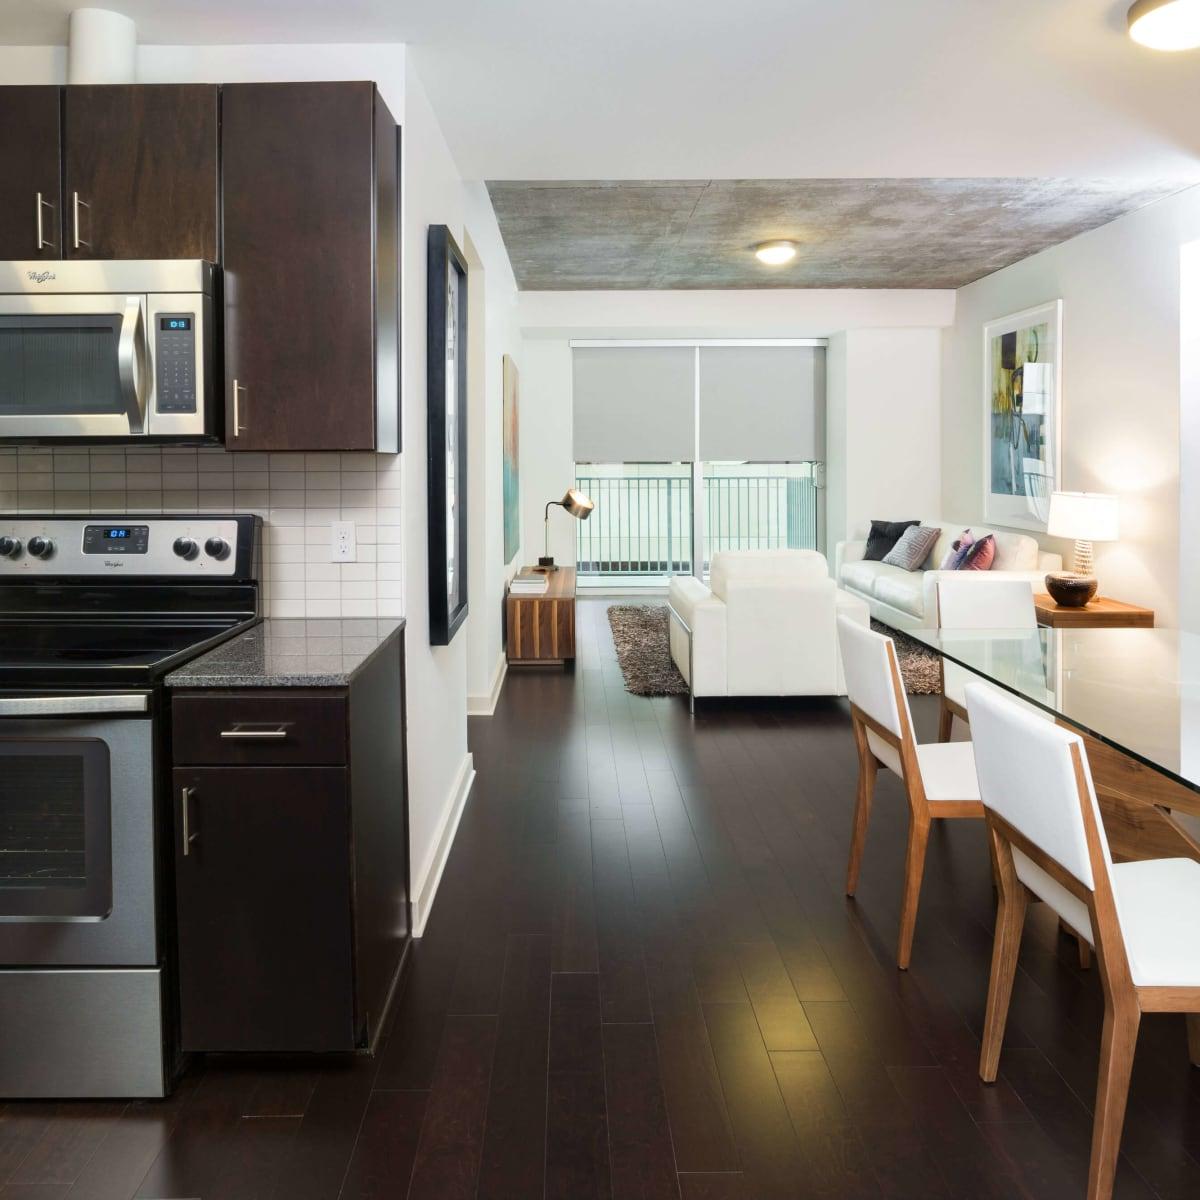 Skyhouse Dallas kitchen